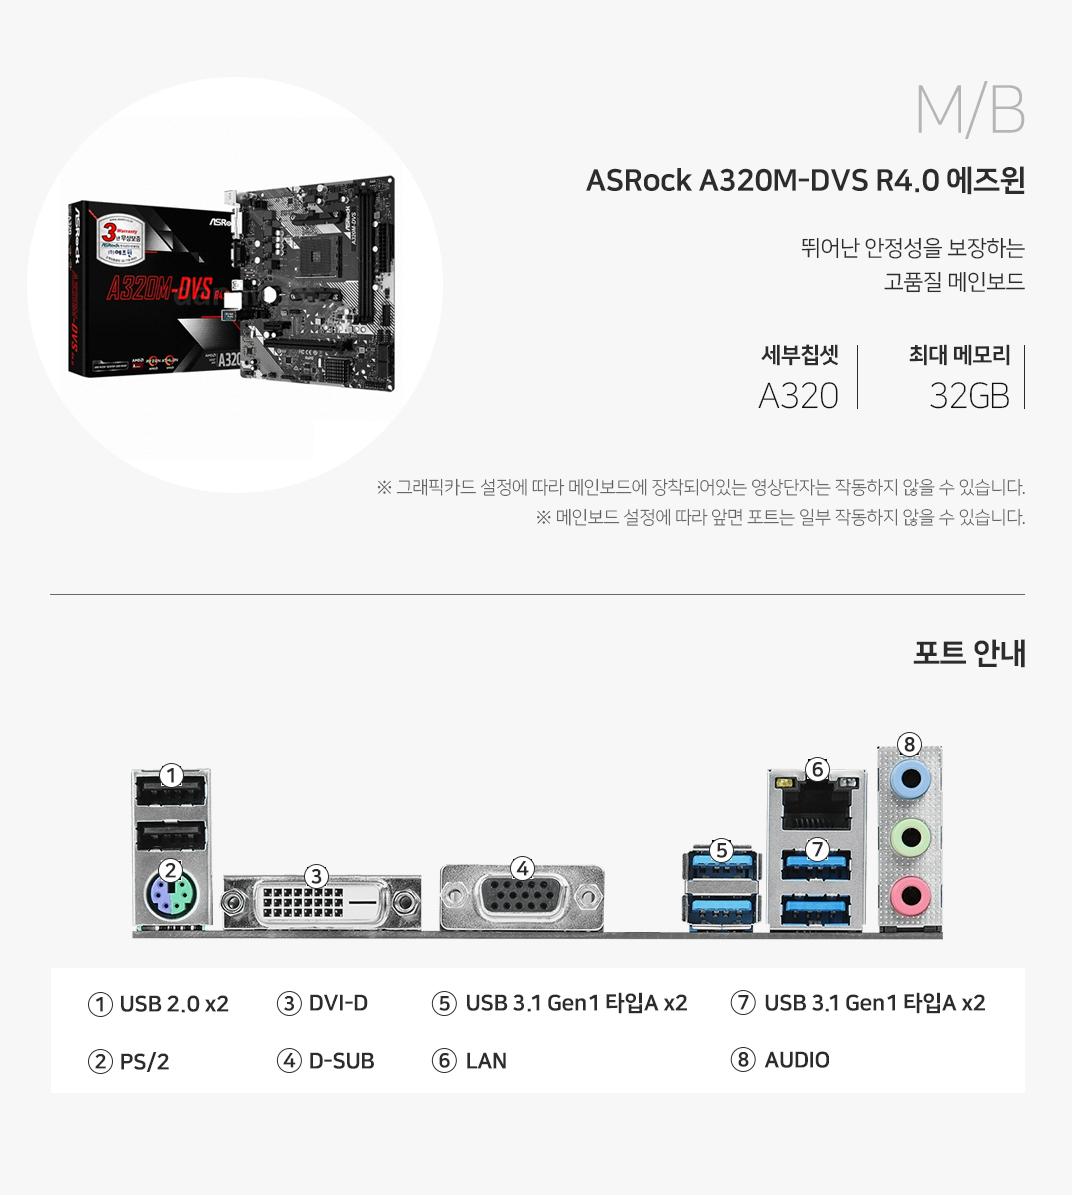 M/B ASRock A320M-DVS R4.0 에즈윈 뛰어난 안정성을 보장하는 고품질 메인보드 세부칩셋  A320 최대메모리 32GB 그래픽 설정에 따라 메인보드에 장착되어 있는 영상단자는 작동하지 않을 수 있습니다. 메인보드 설정에 따라 앞면 포트는 일부 작동하지 않을 수 있습니다.